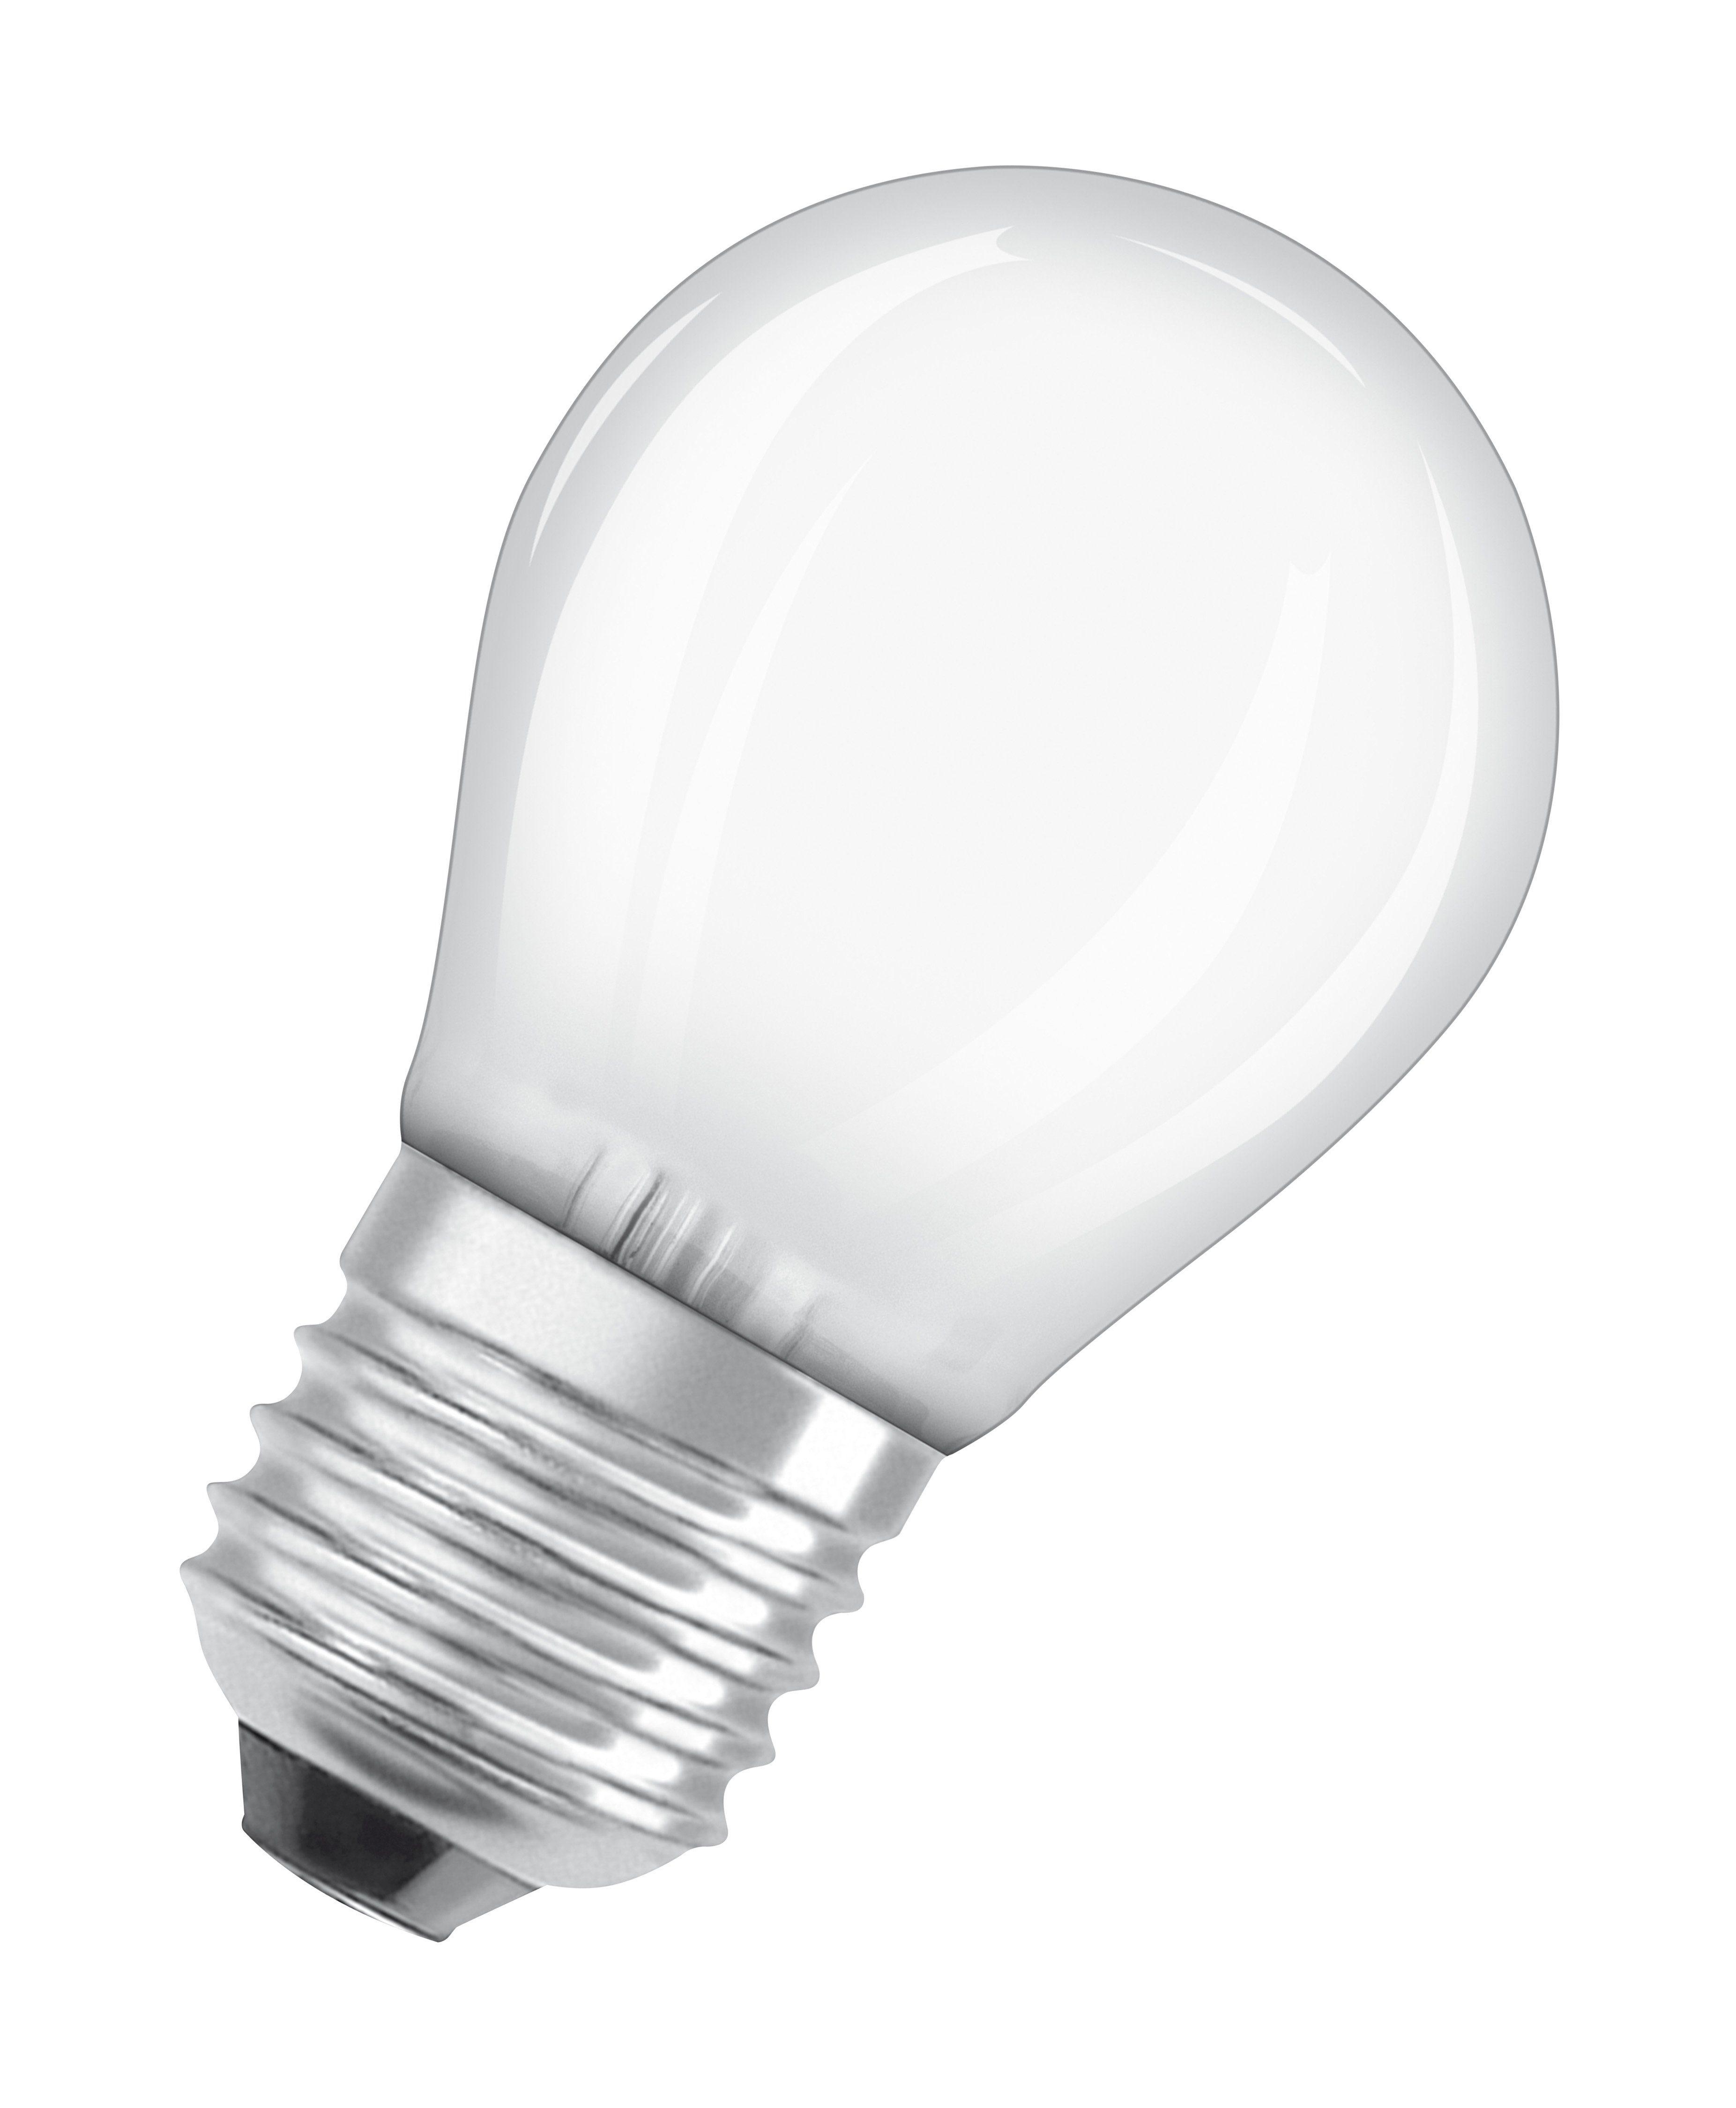 Osram LED Retrofit CLASSIC P Dimmable - Dimmbare LED-Lampe »SST CLAS P 25 300° 2.5 W/827 E27 DIM«